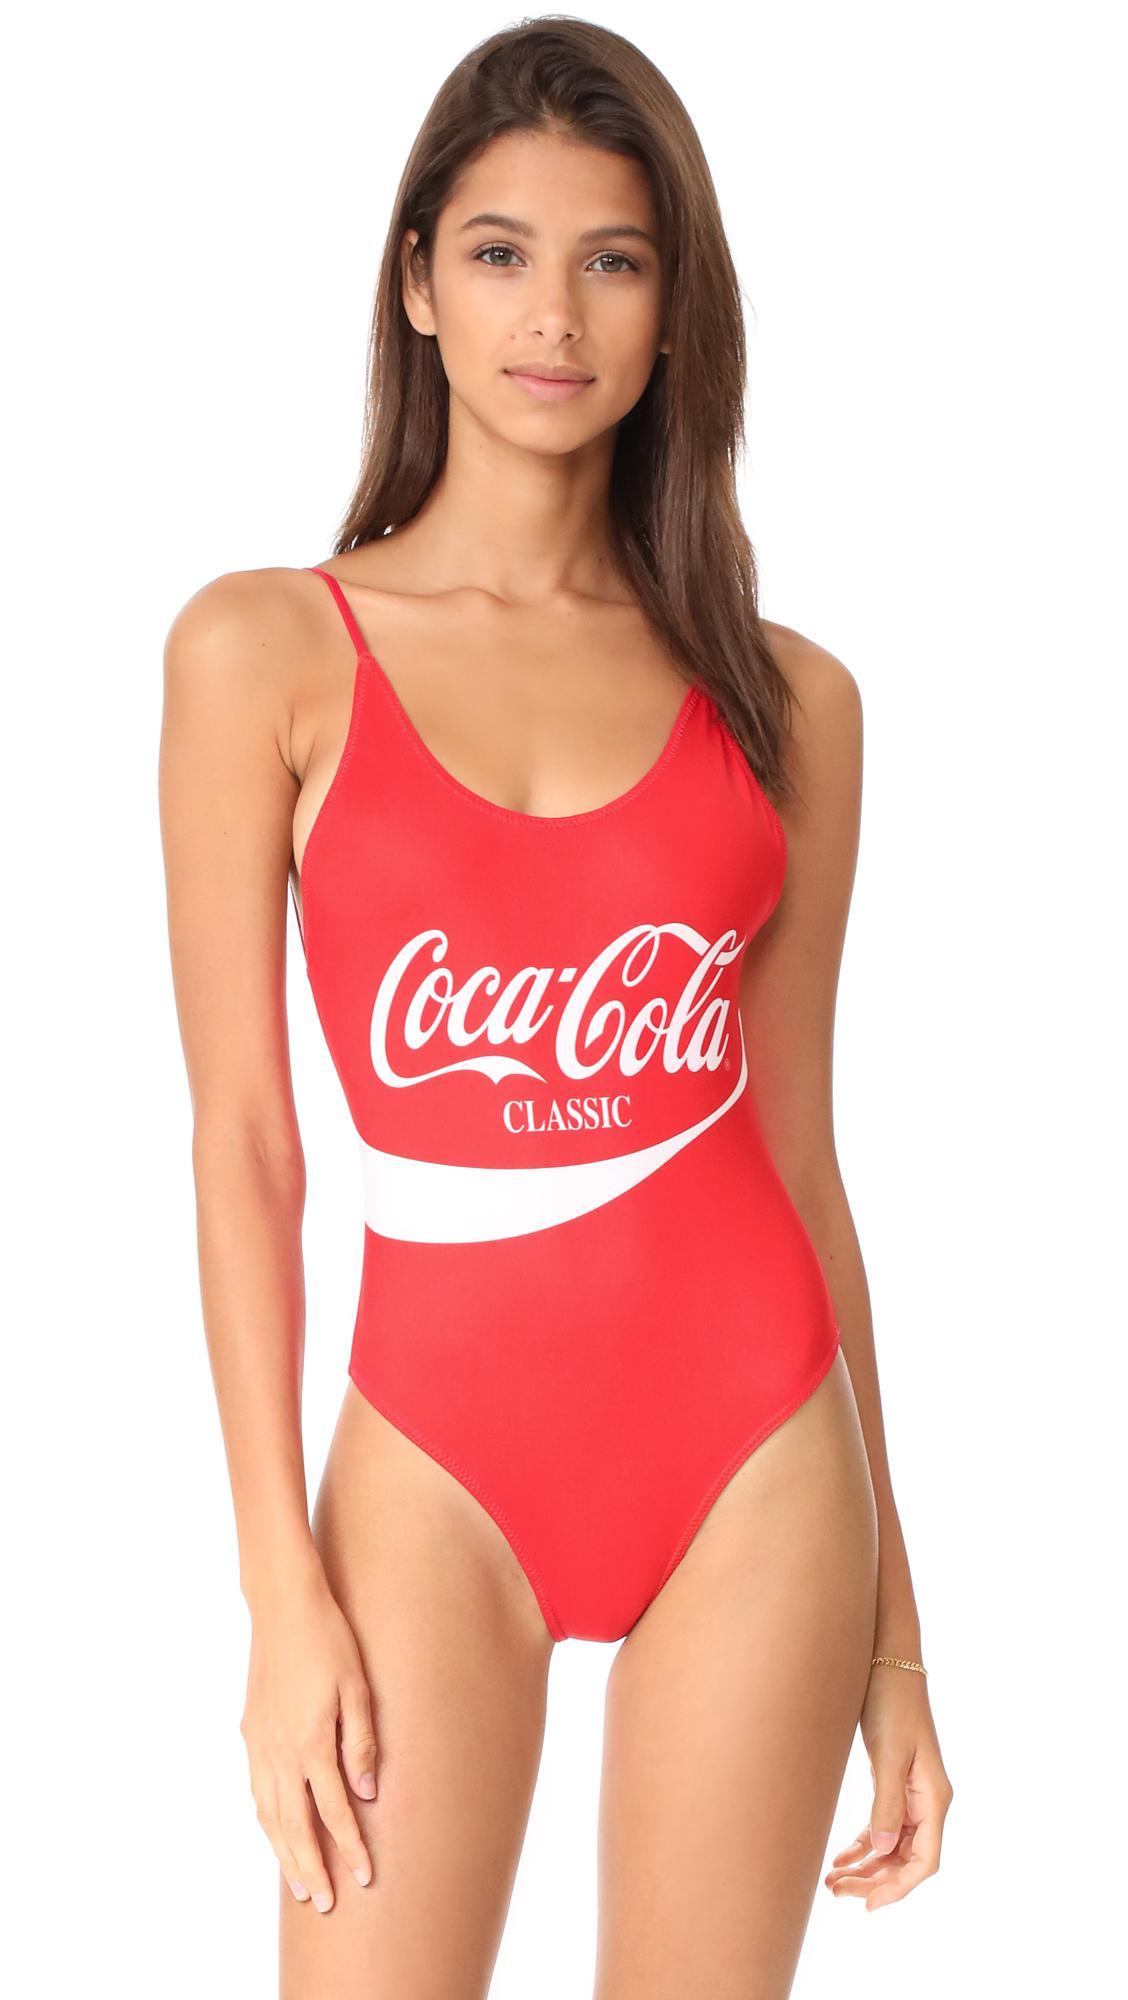 e23c89121e Lyst - Chaser Coca Cola Classic One Piece in Red